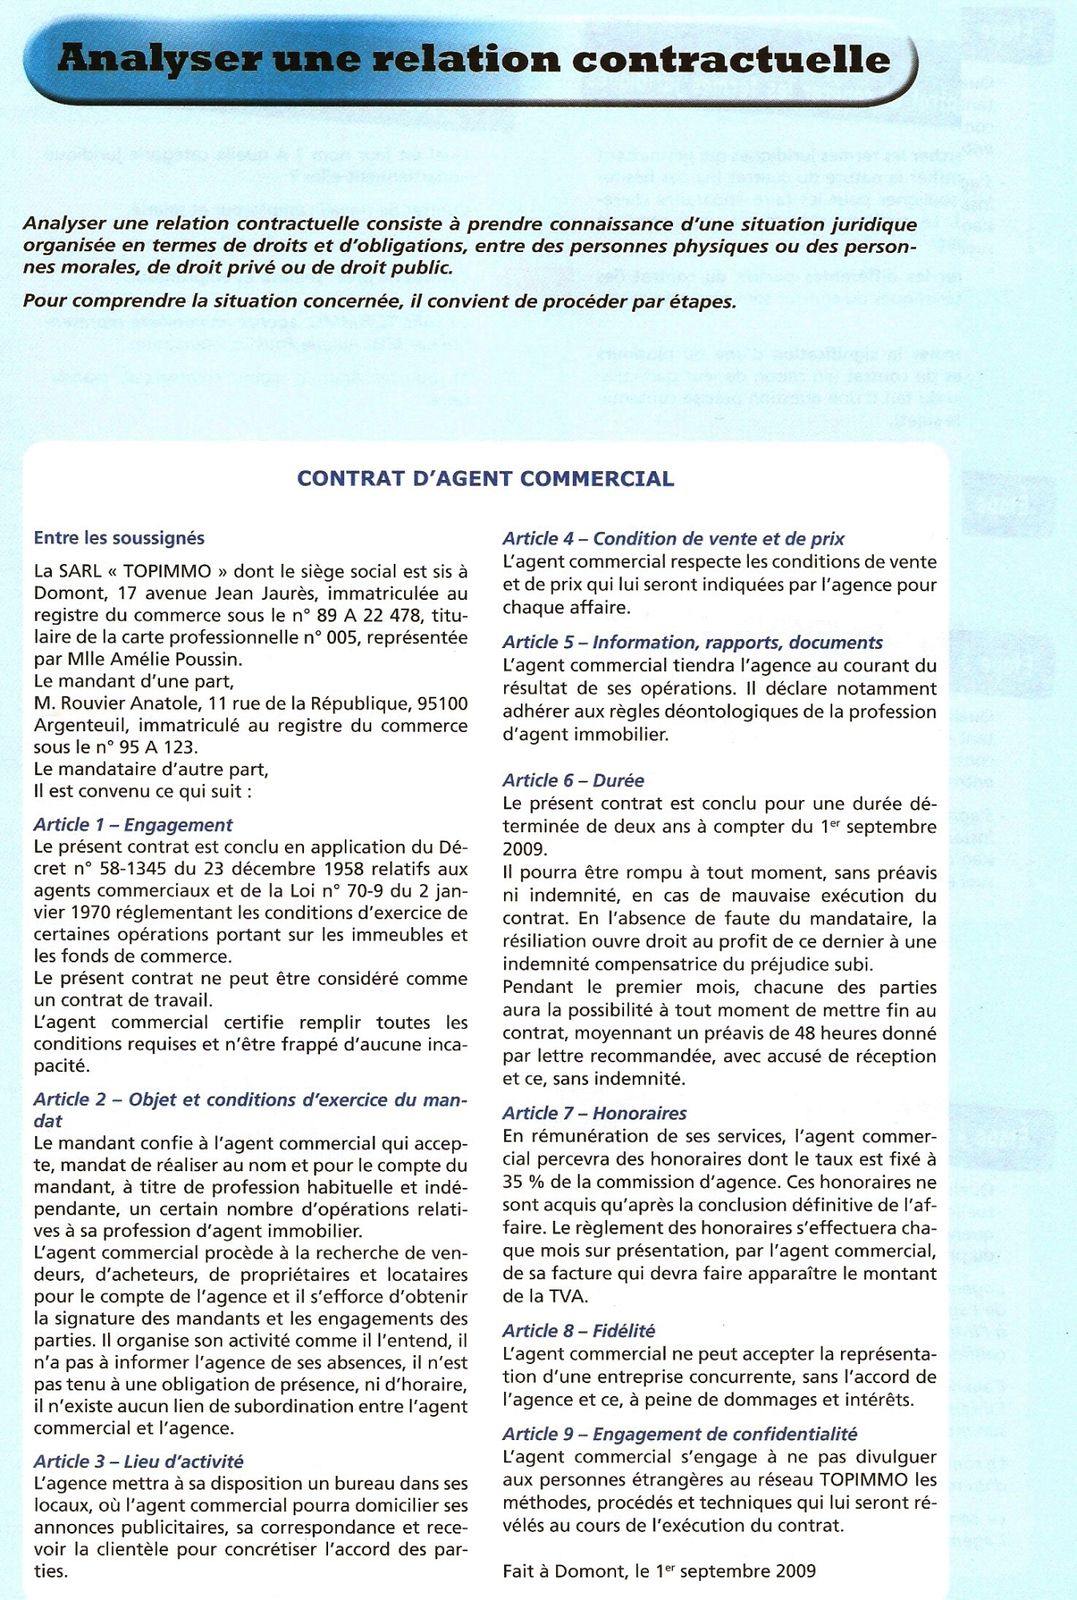 agence matrimoniale en ligne Boulogne-sur-Mer